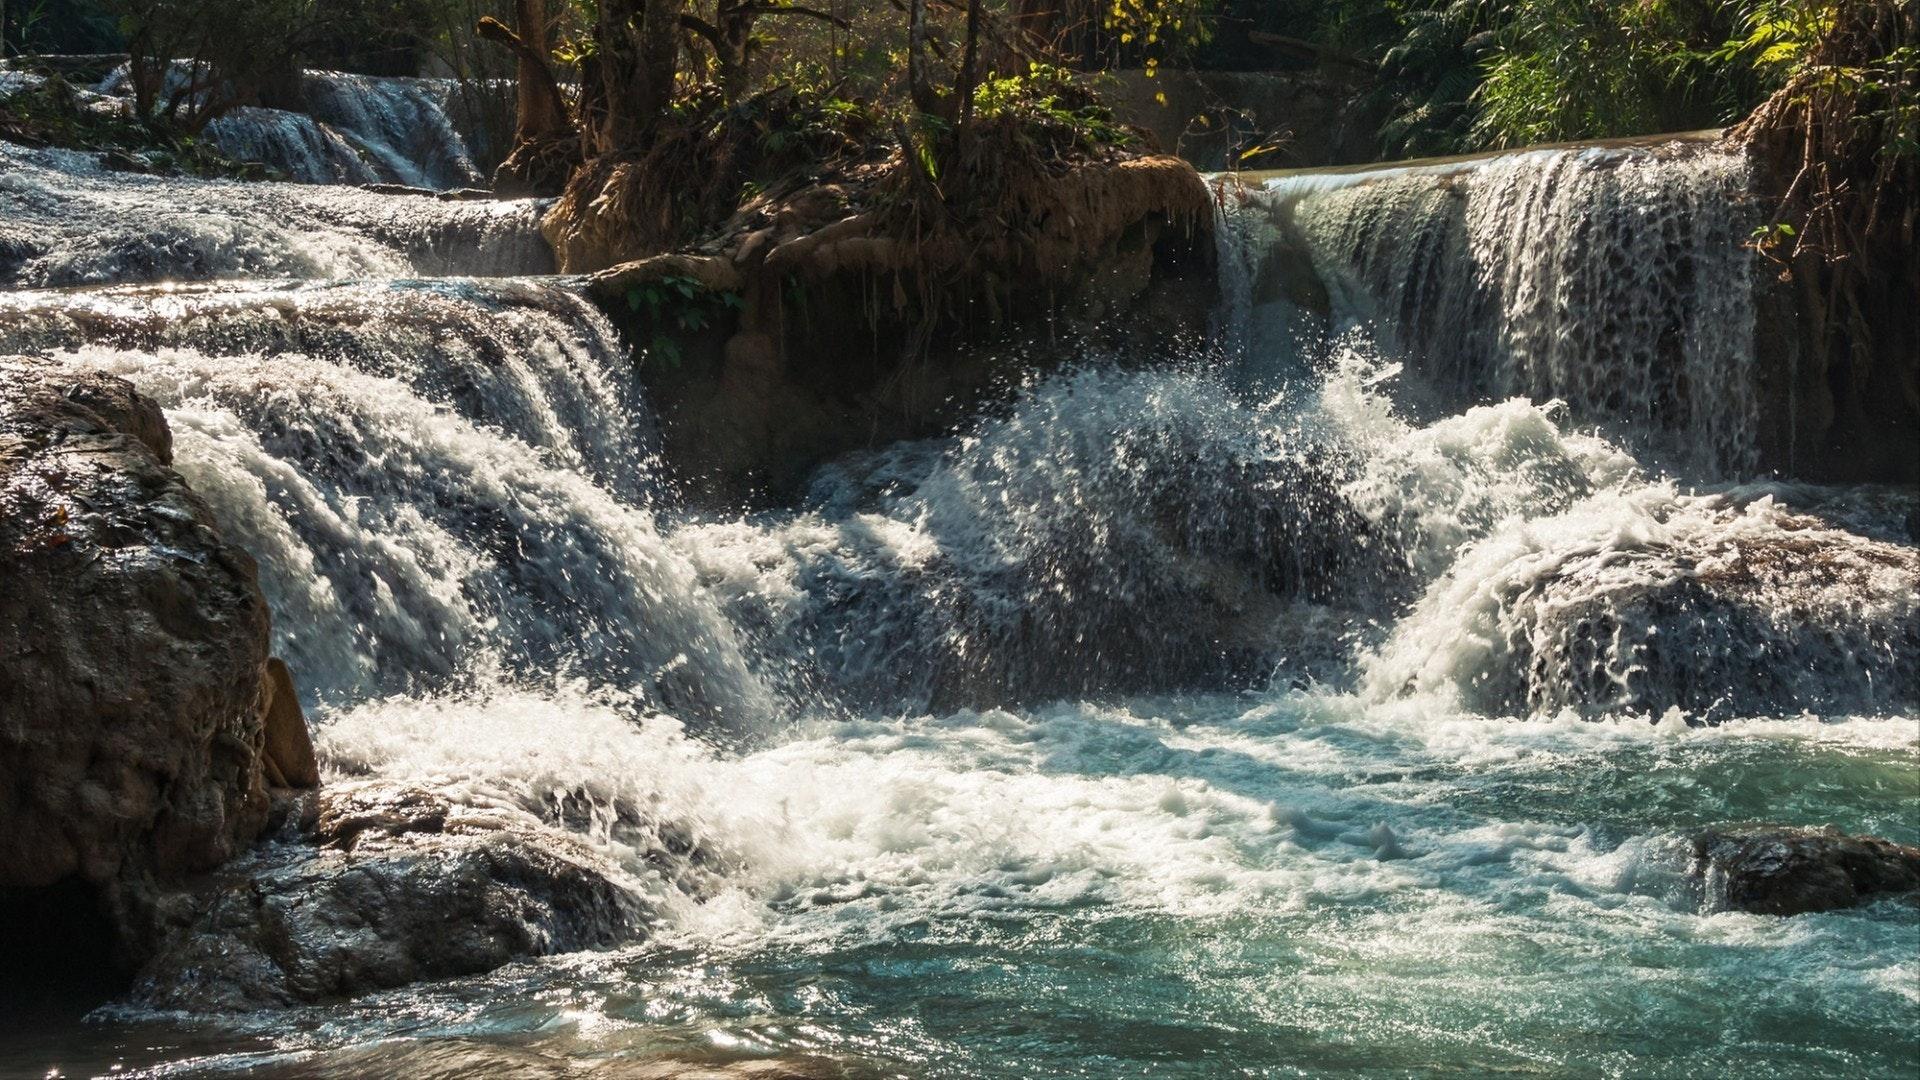 Kuang Si Falls near Luang Prabang, Laos, South East Asia